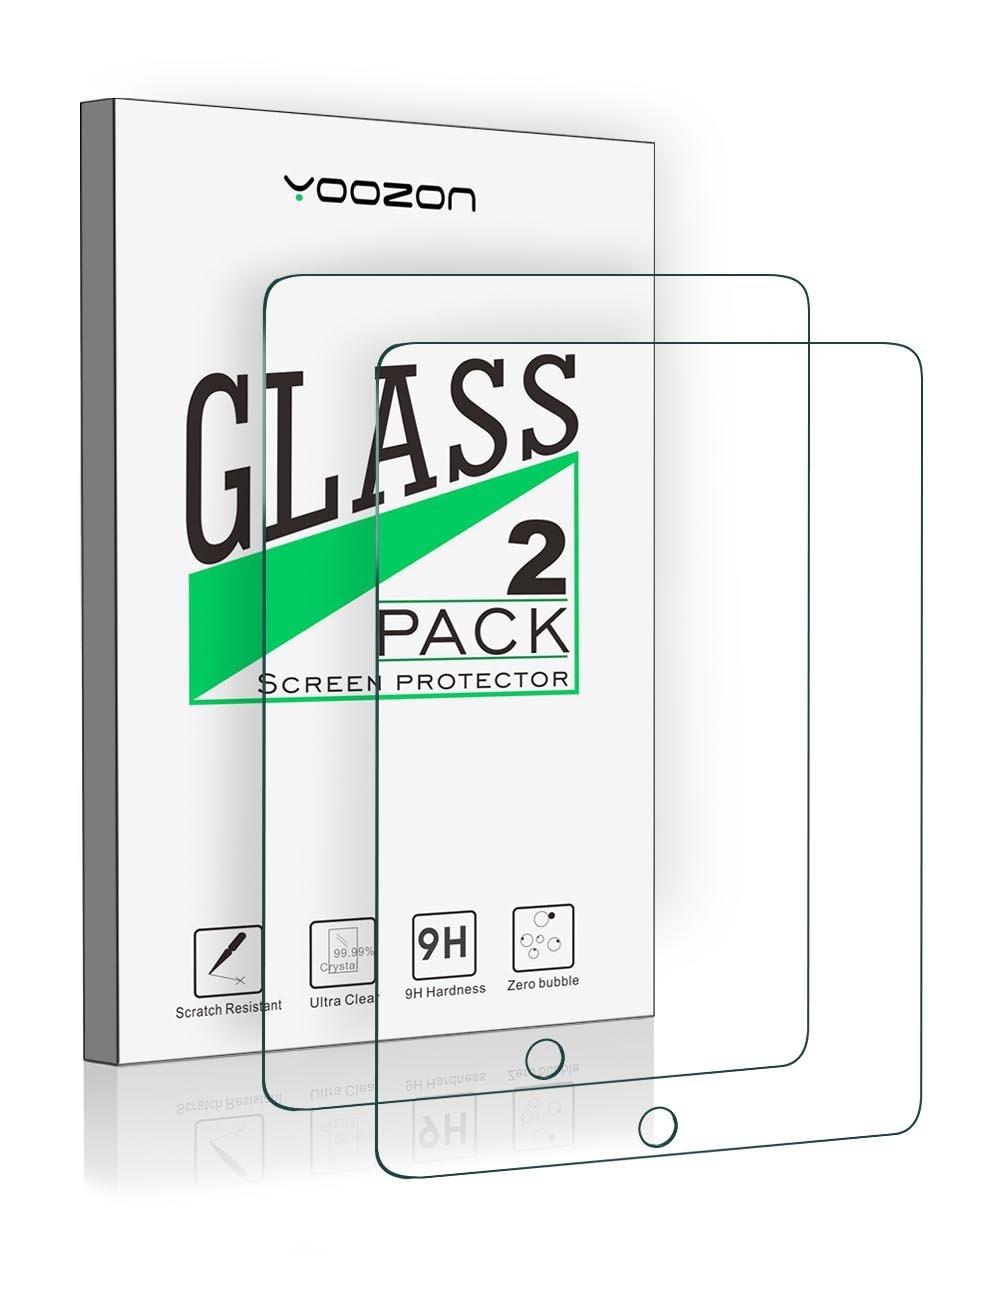 New iPad 9.7 Inch 2017/iPad Pro 9.7 Inch/iPad Air 2/iPad Air Screen Protector Glass [2-Pack],Yoozon Tempered Glass Screen Protector for Apple iPad Air, iPad Air 2, iPad Pro 9.7,iPad 9.7 [2-Pack]